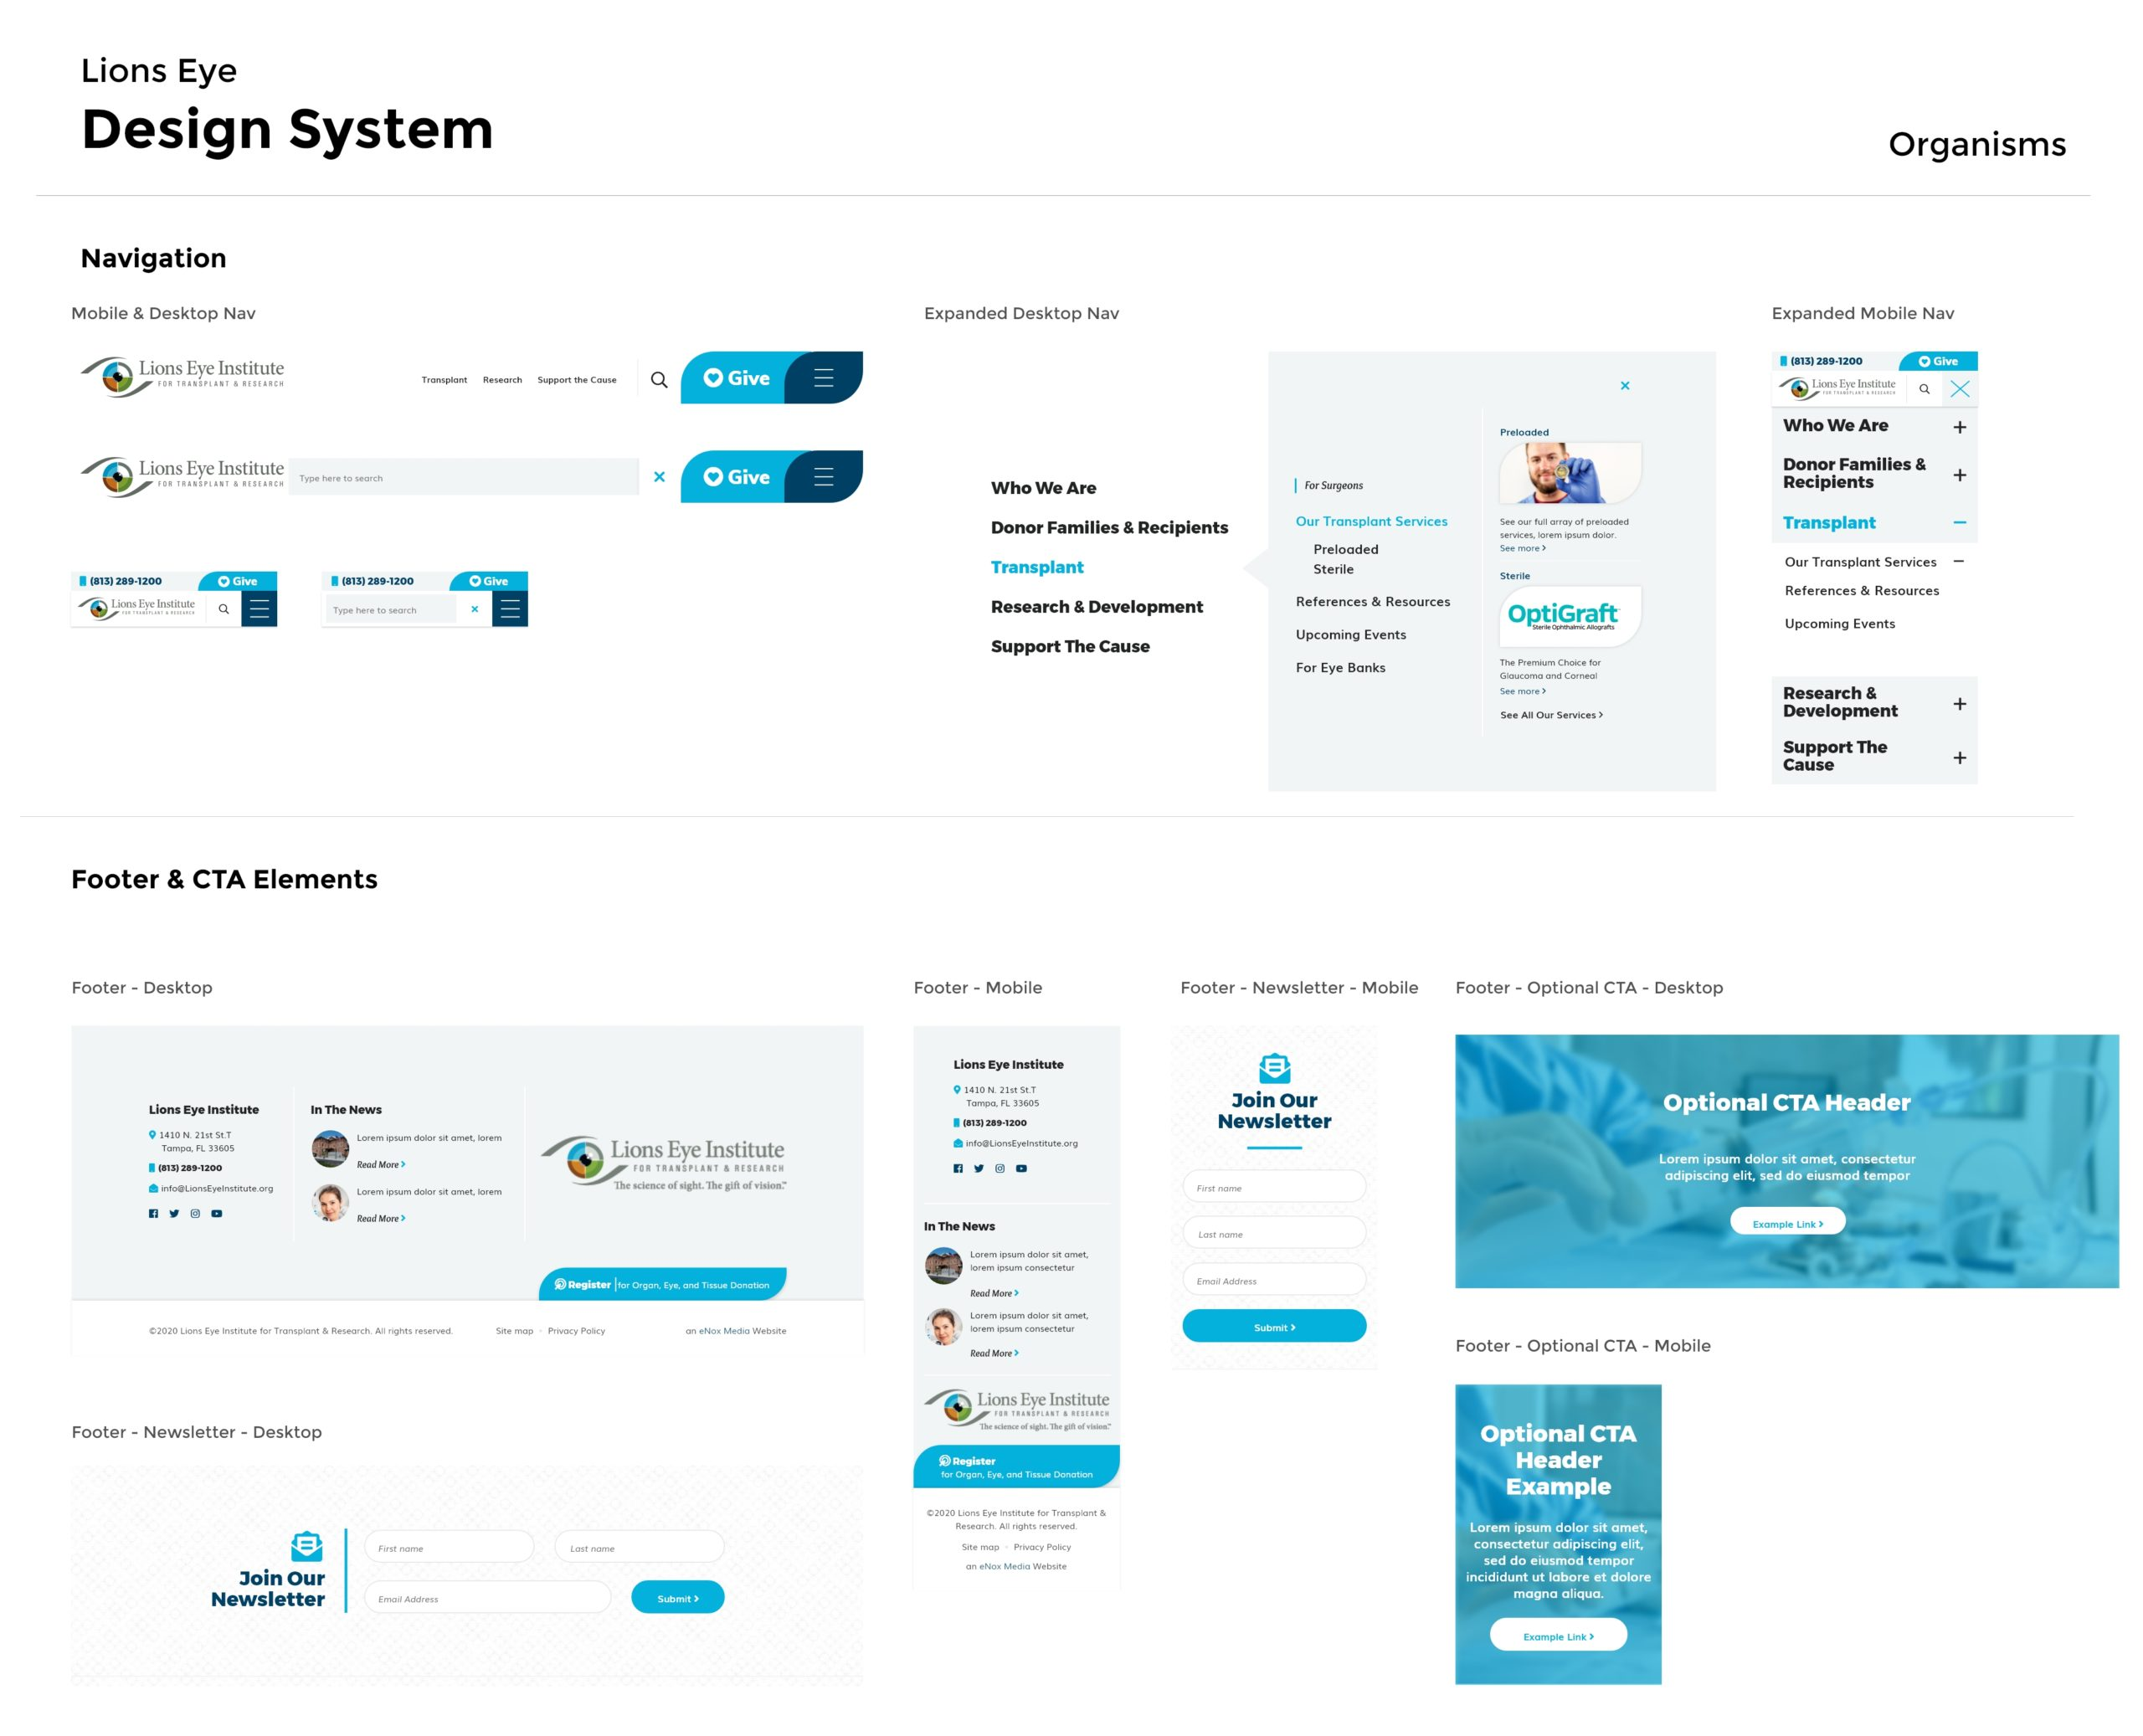 Lions Eye Design System - Organisms